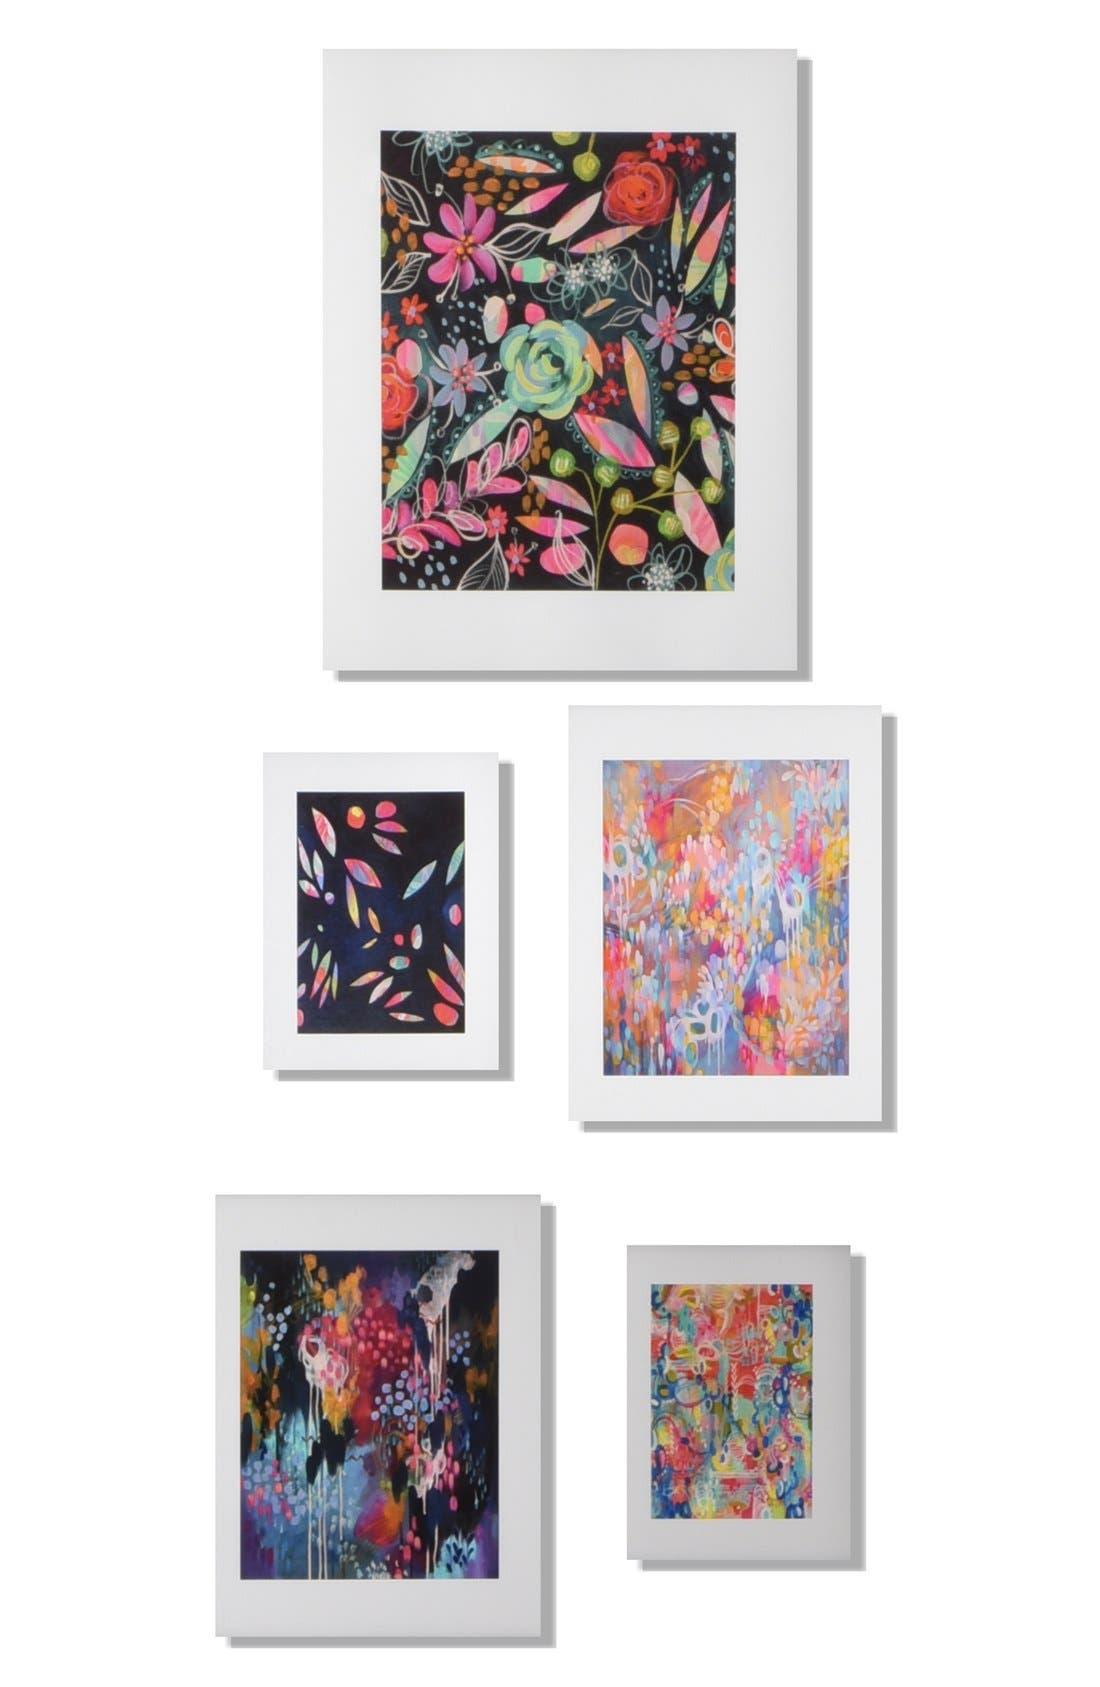 Main Image - Deny Designs 'Twilight' Wall Art Gallery (Set of 5)